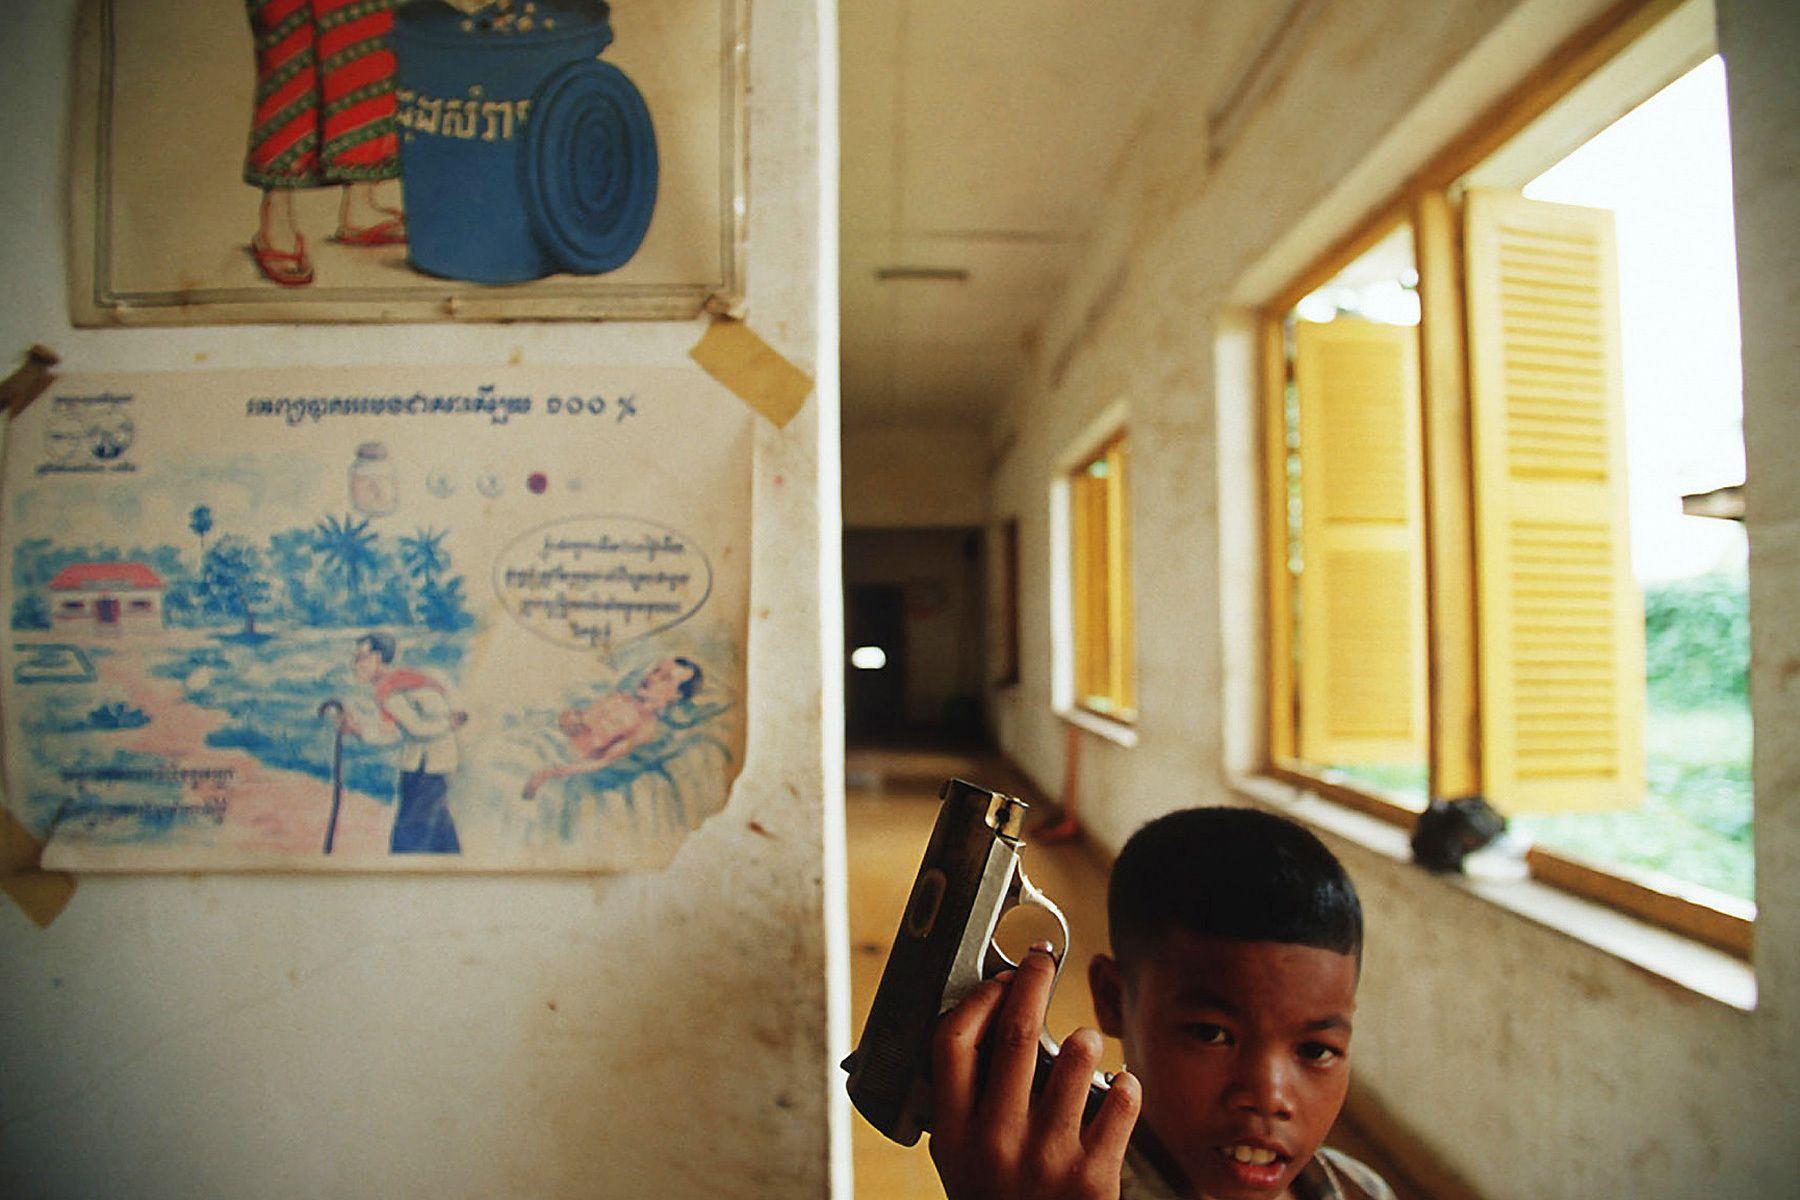 A boy with a toy gun, plays inside Aids ward.